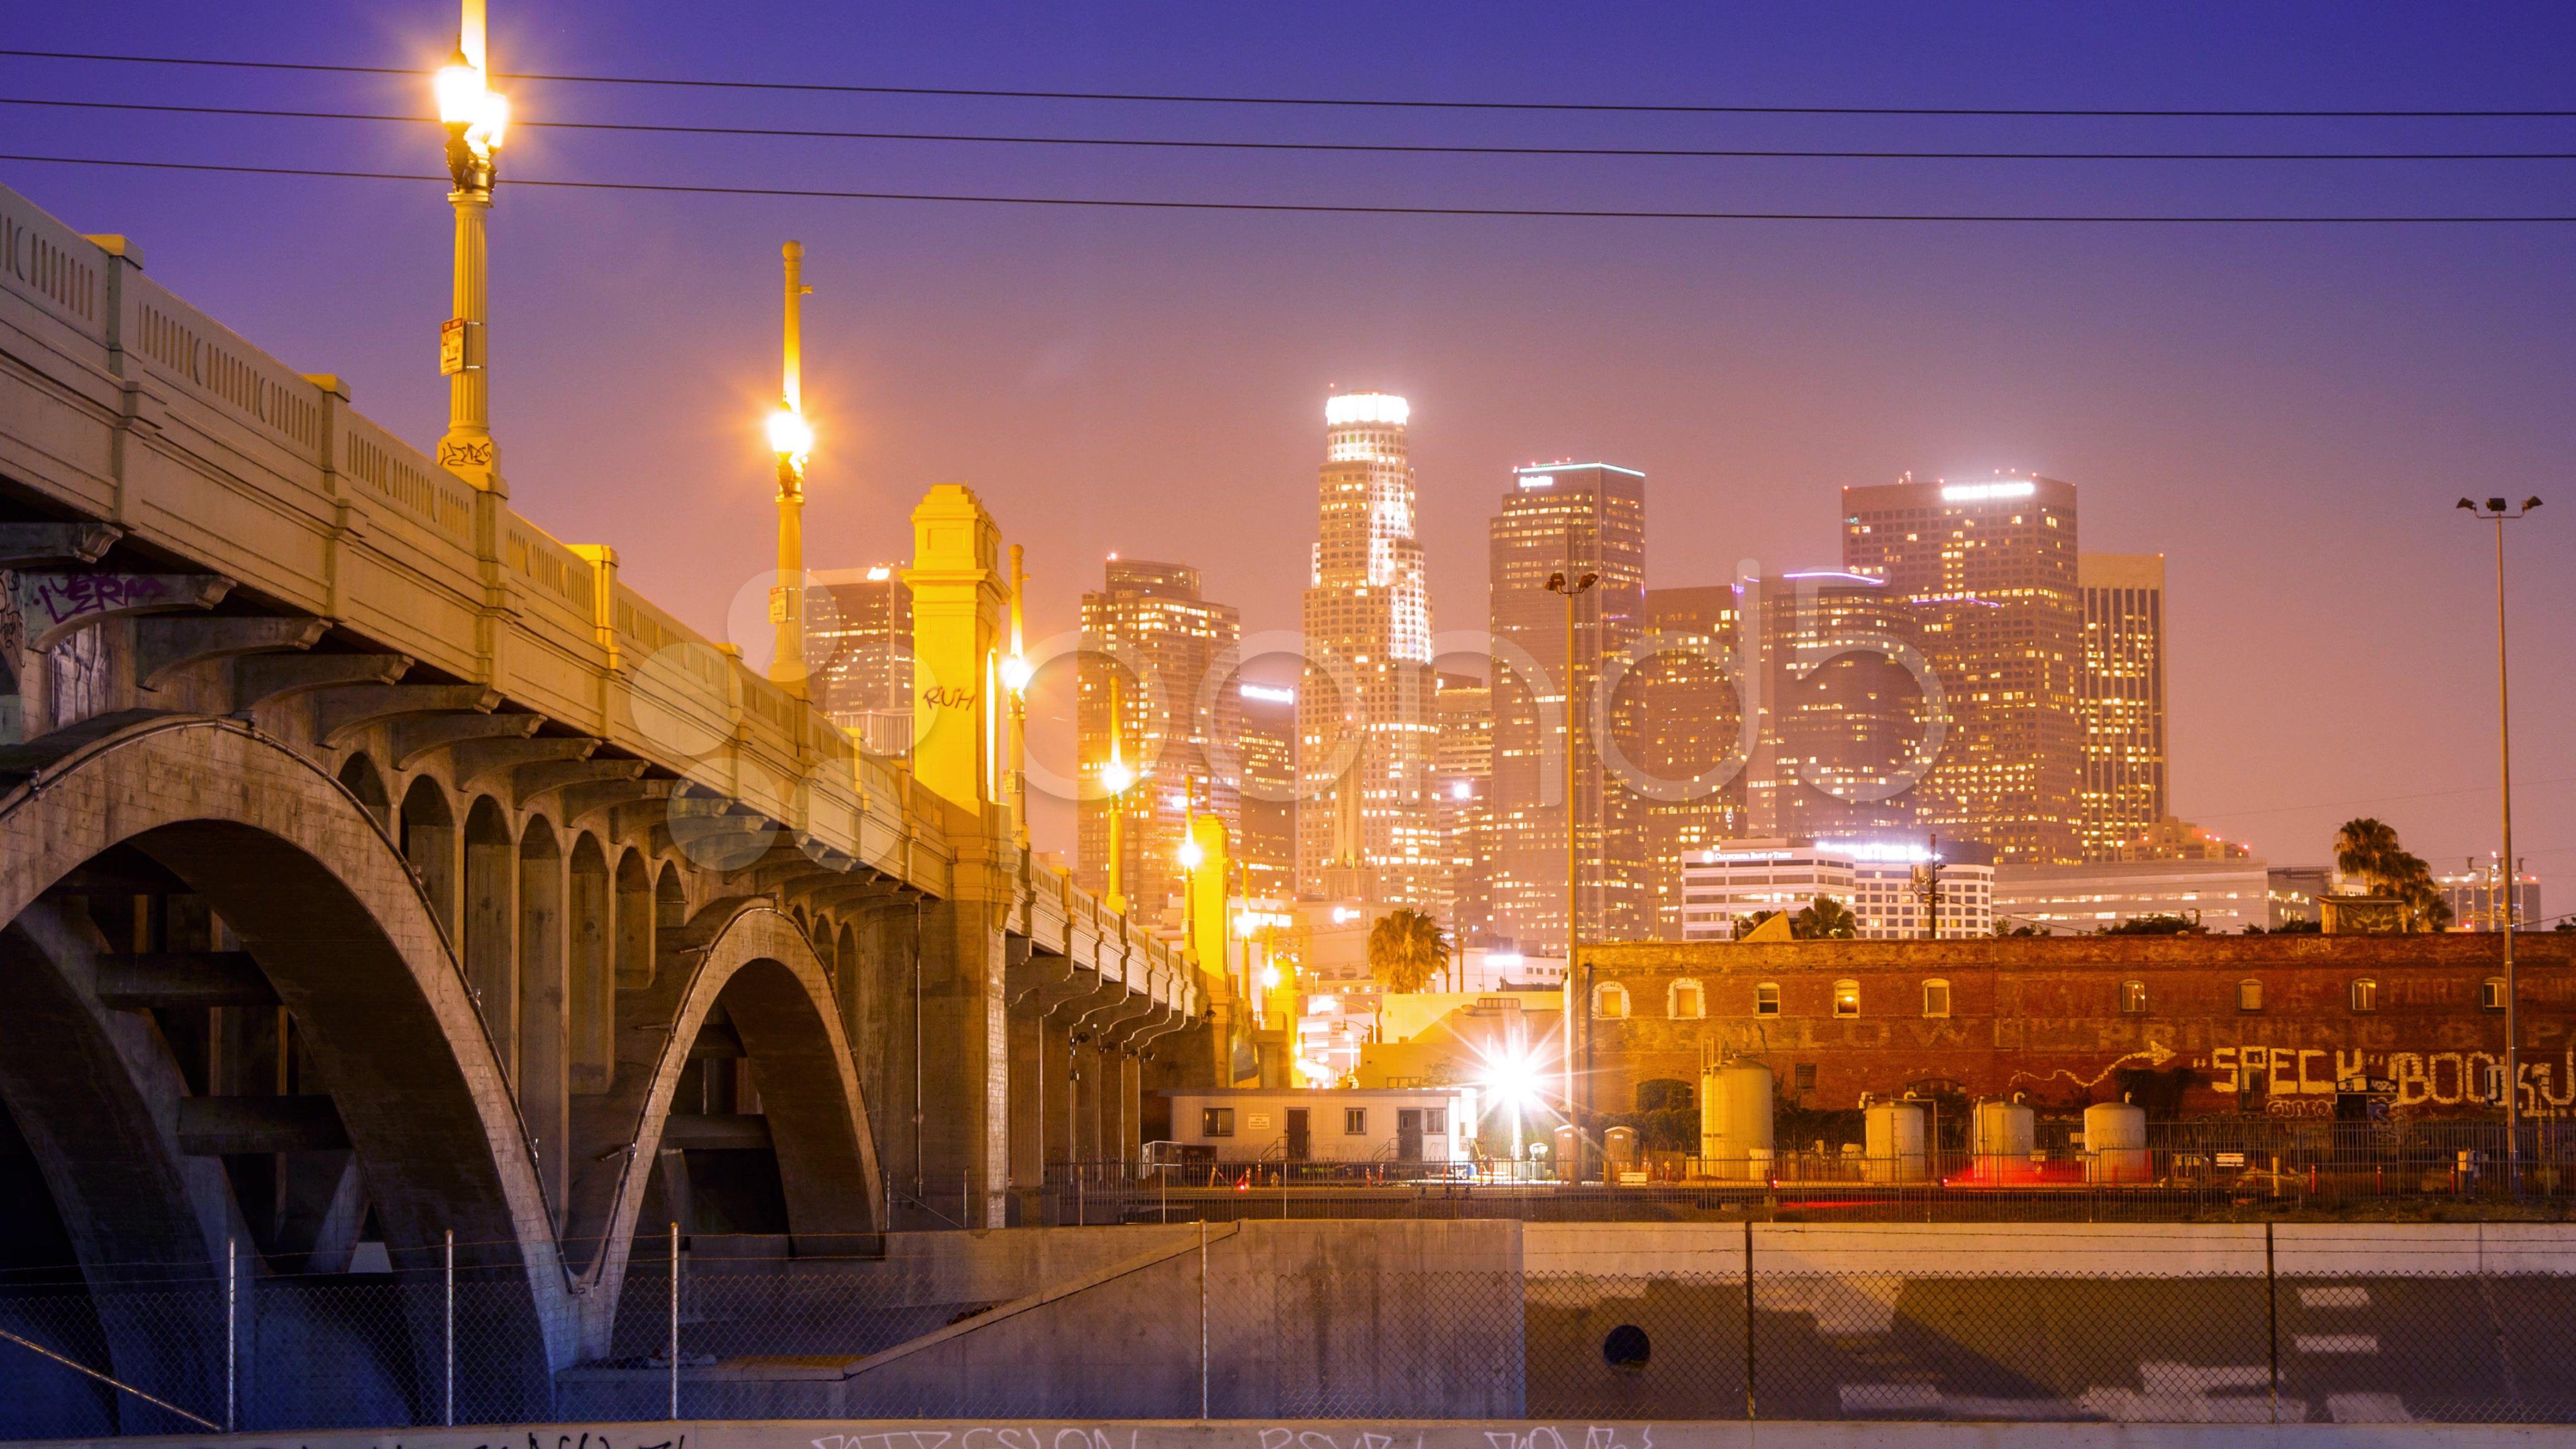 4k Los Angeles City Downtown Skyline At Night Motion Timelapse Hyperlapse Stock Footage Downtown Skyline Cit Los Angeles Skyline Los Angeles City Skyline